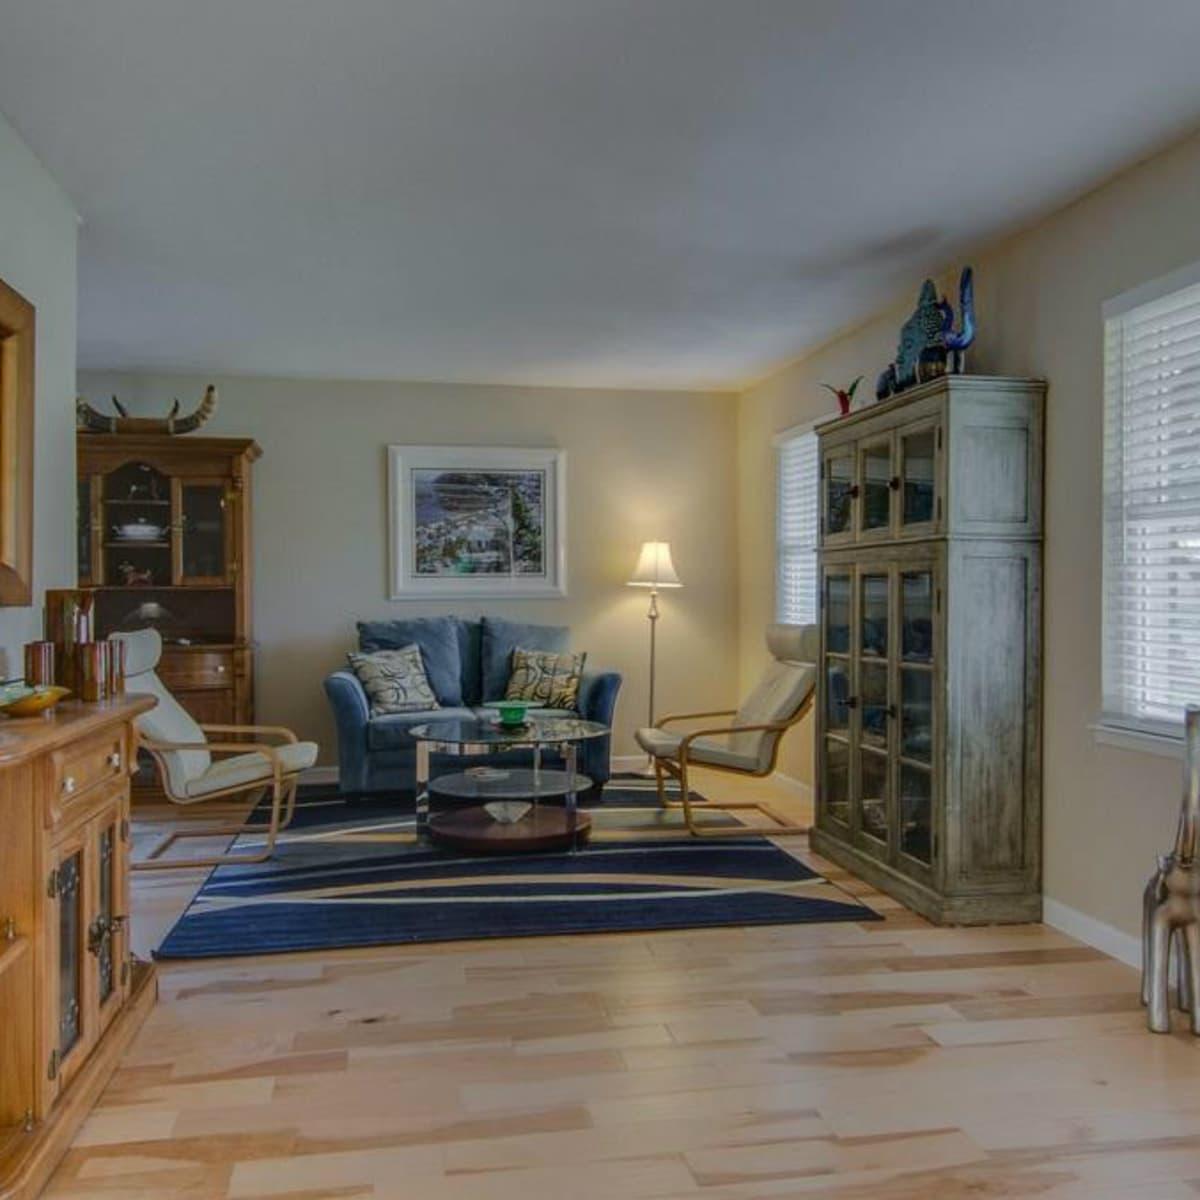 3065 Kinkaid Dr. living room in Dallas